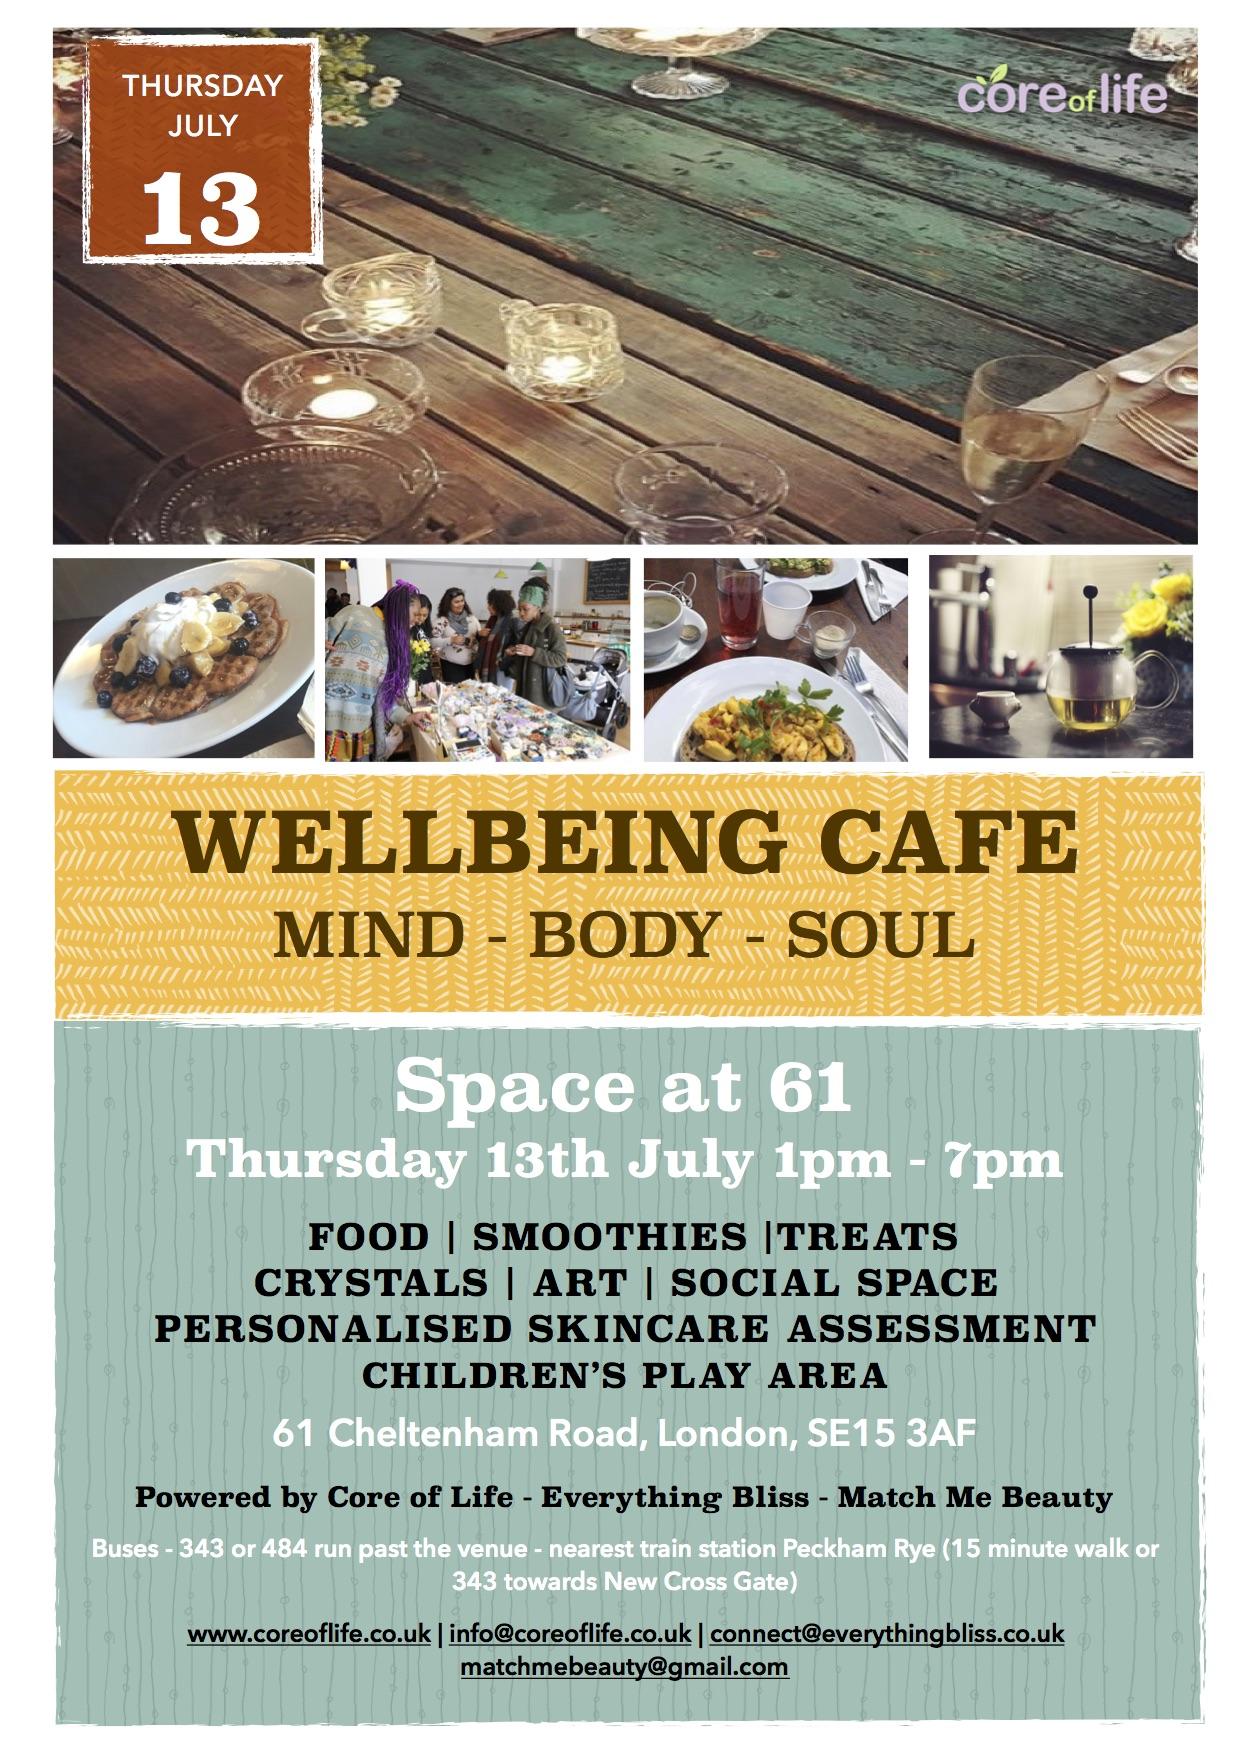 www.coreoflife.co.uk - Wellbeing Cafe